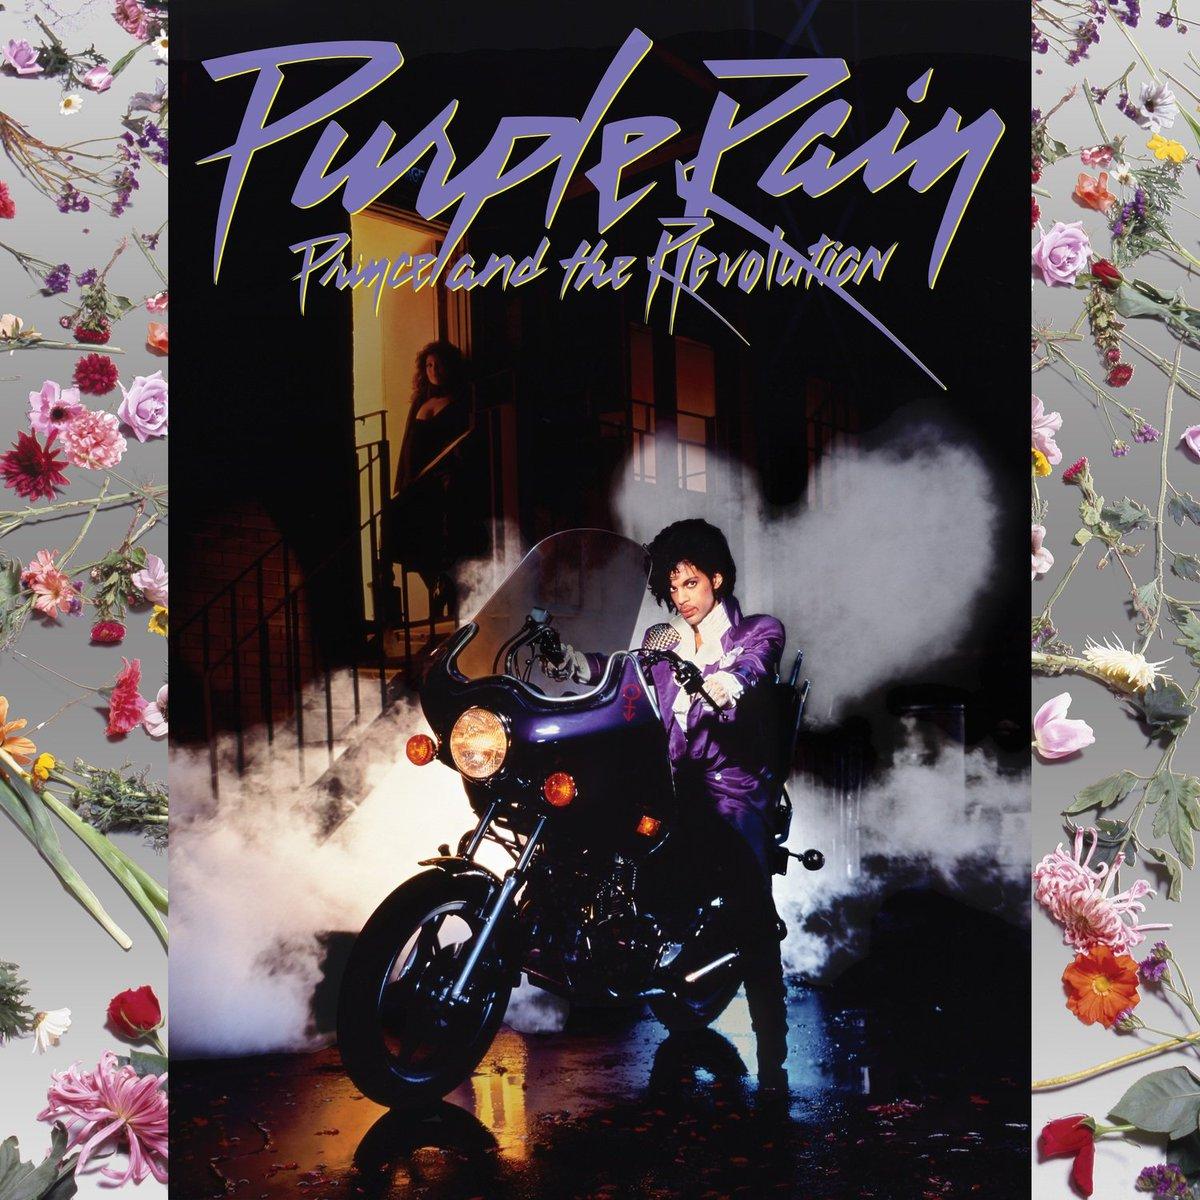 @mitchlafon #PurpleRain by #Prince 💜